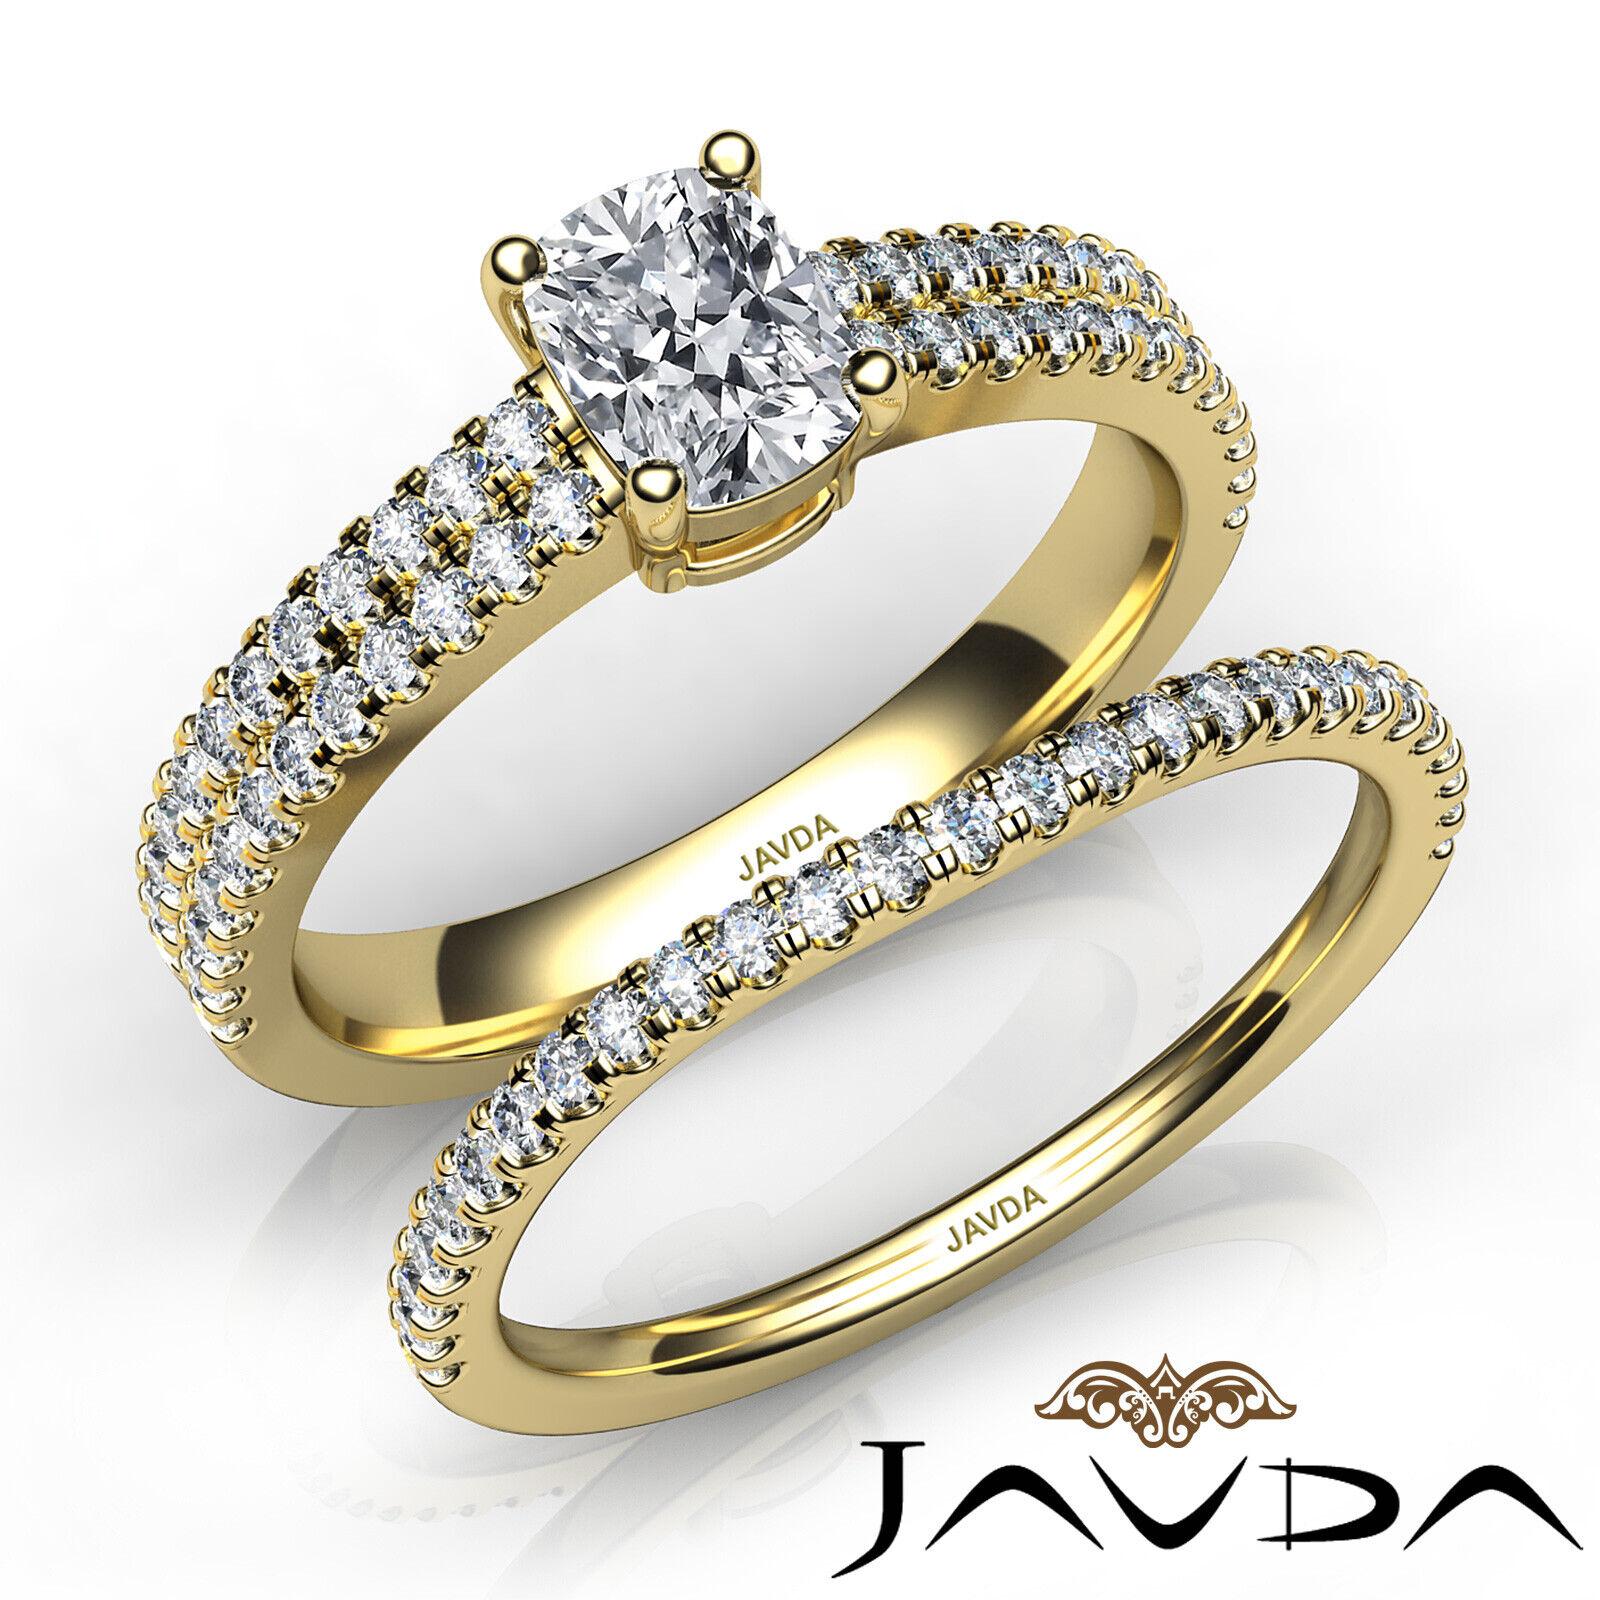 1.8ctw Bridal Scalloped Pave Cushion Diamond Engagement Ring GIA F-VVS2 W Gold 8